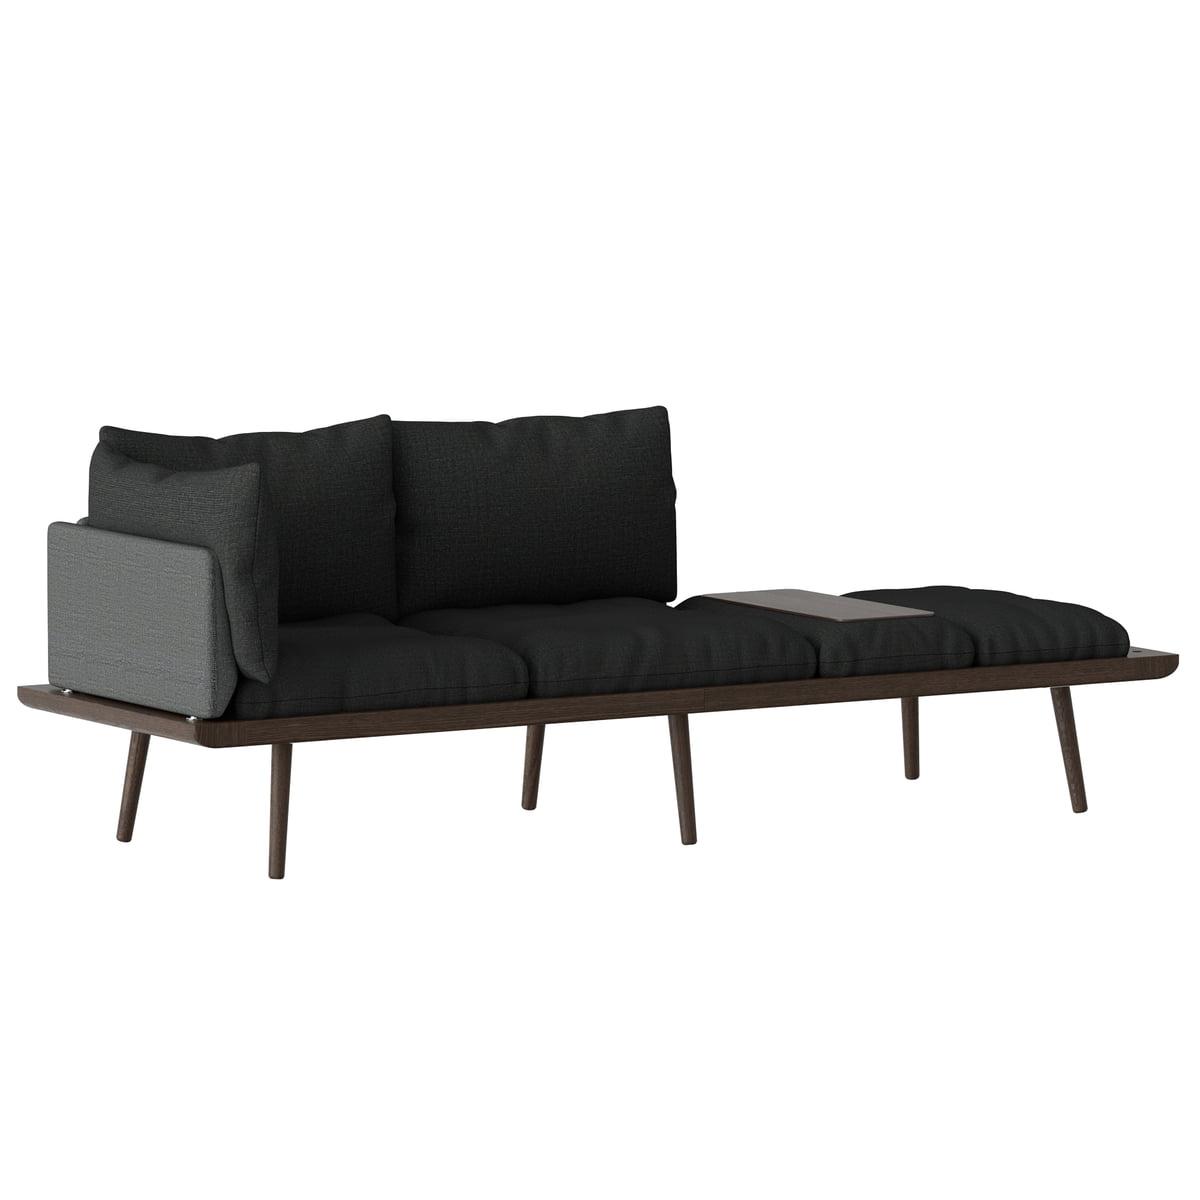 Umage lounge around 3 sitzer sofa eiche dunkel slate grey frei